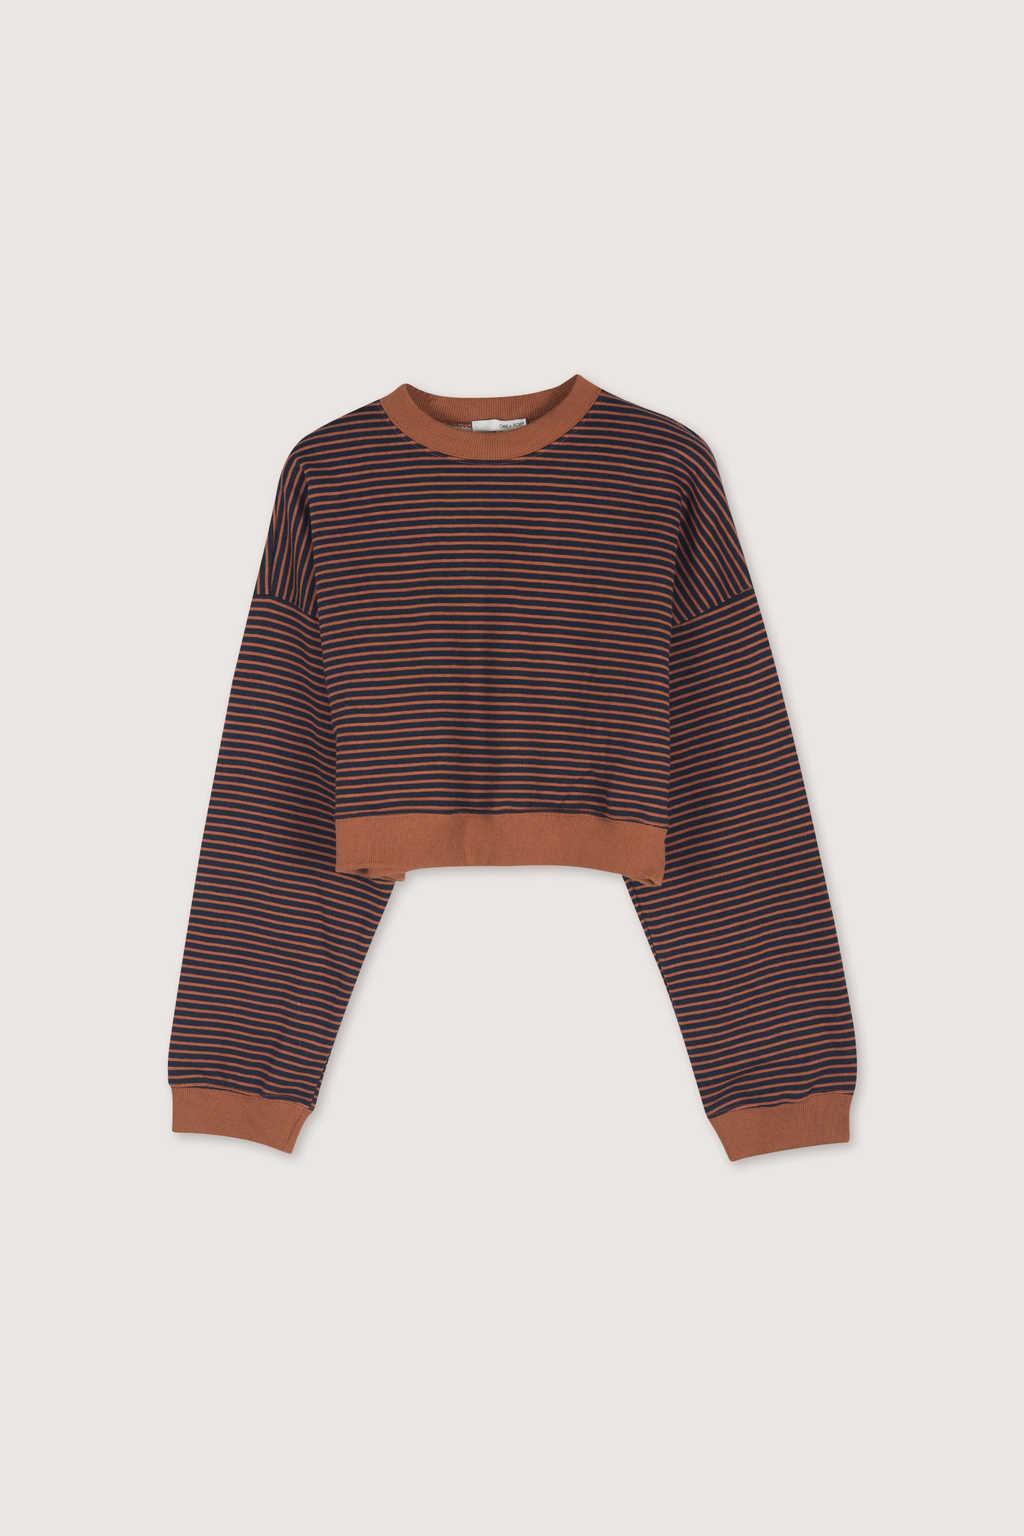 TShirt H411 Brown 5